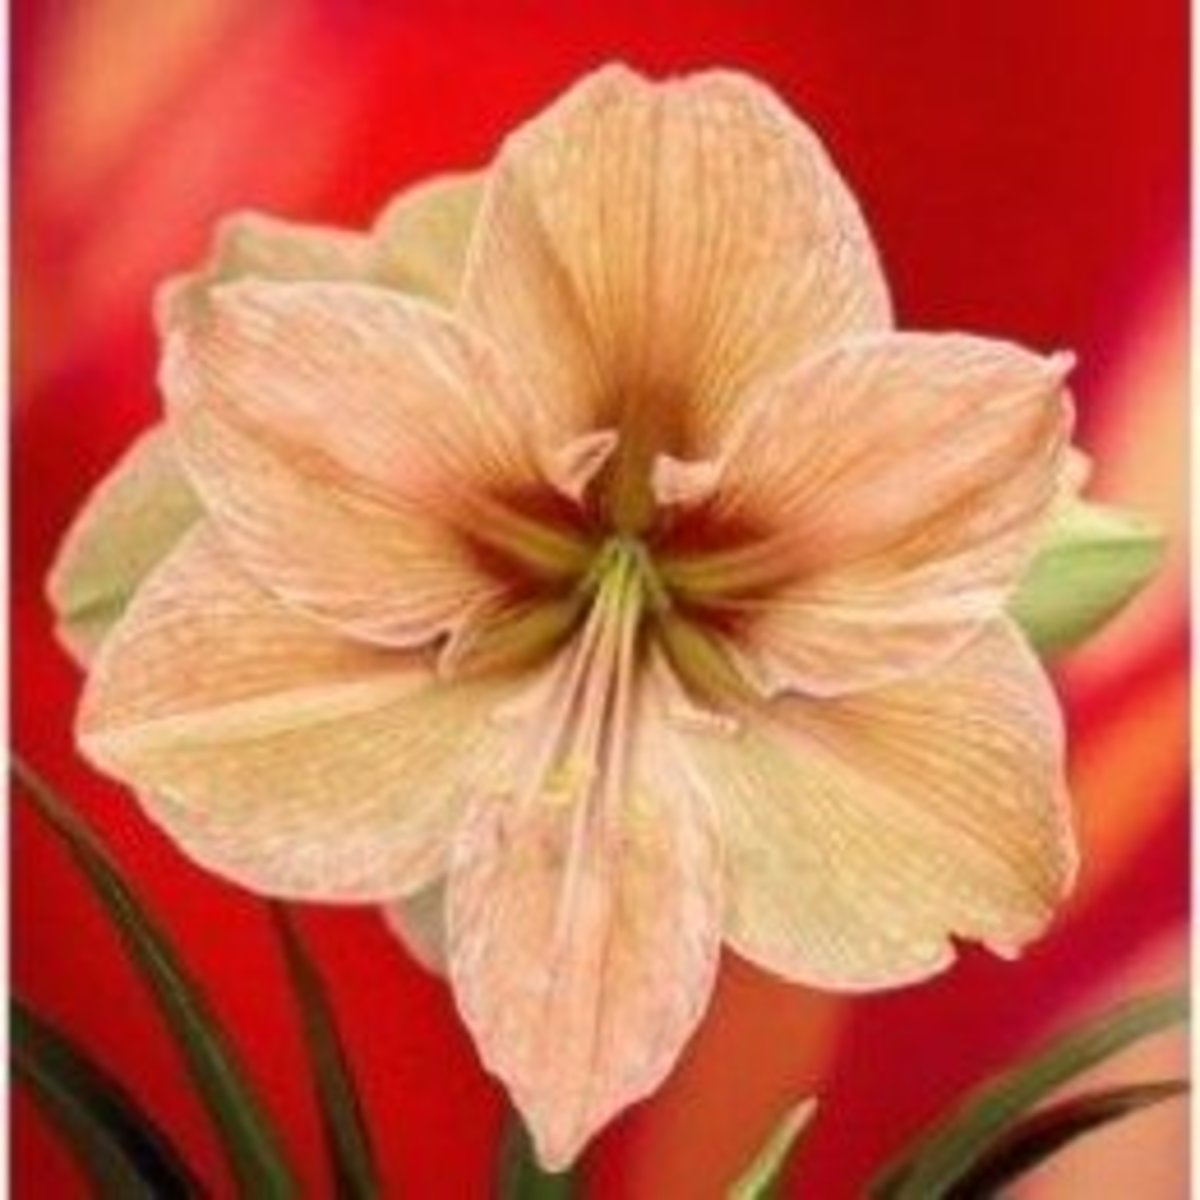 Re-grow your amaryllis